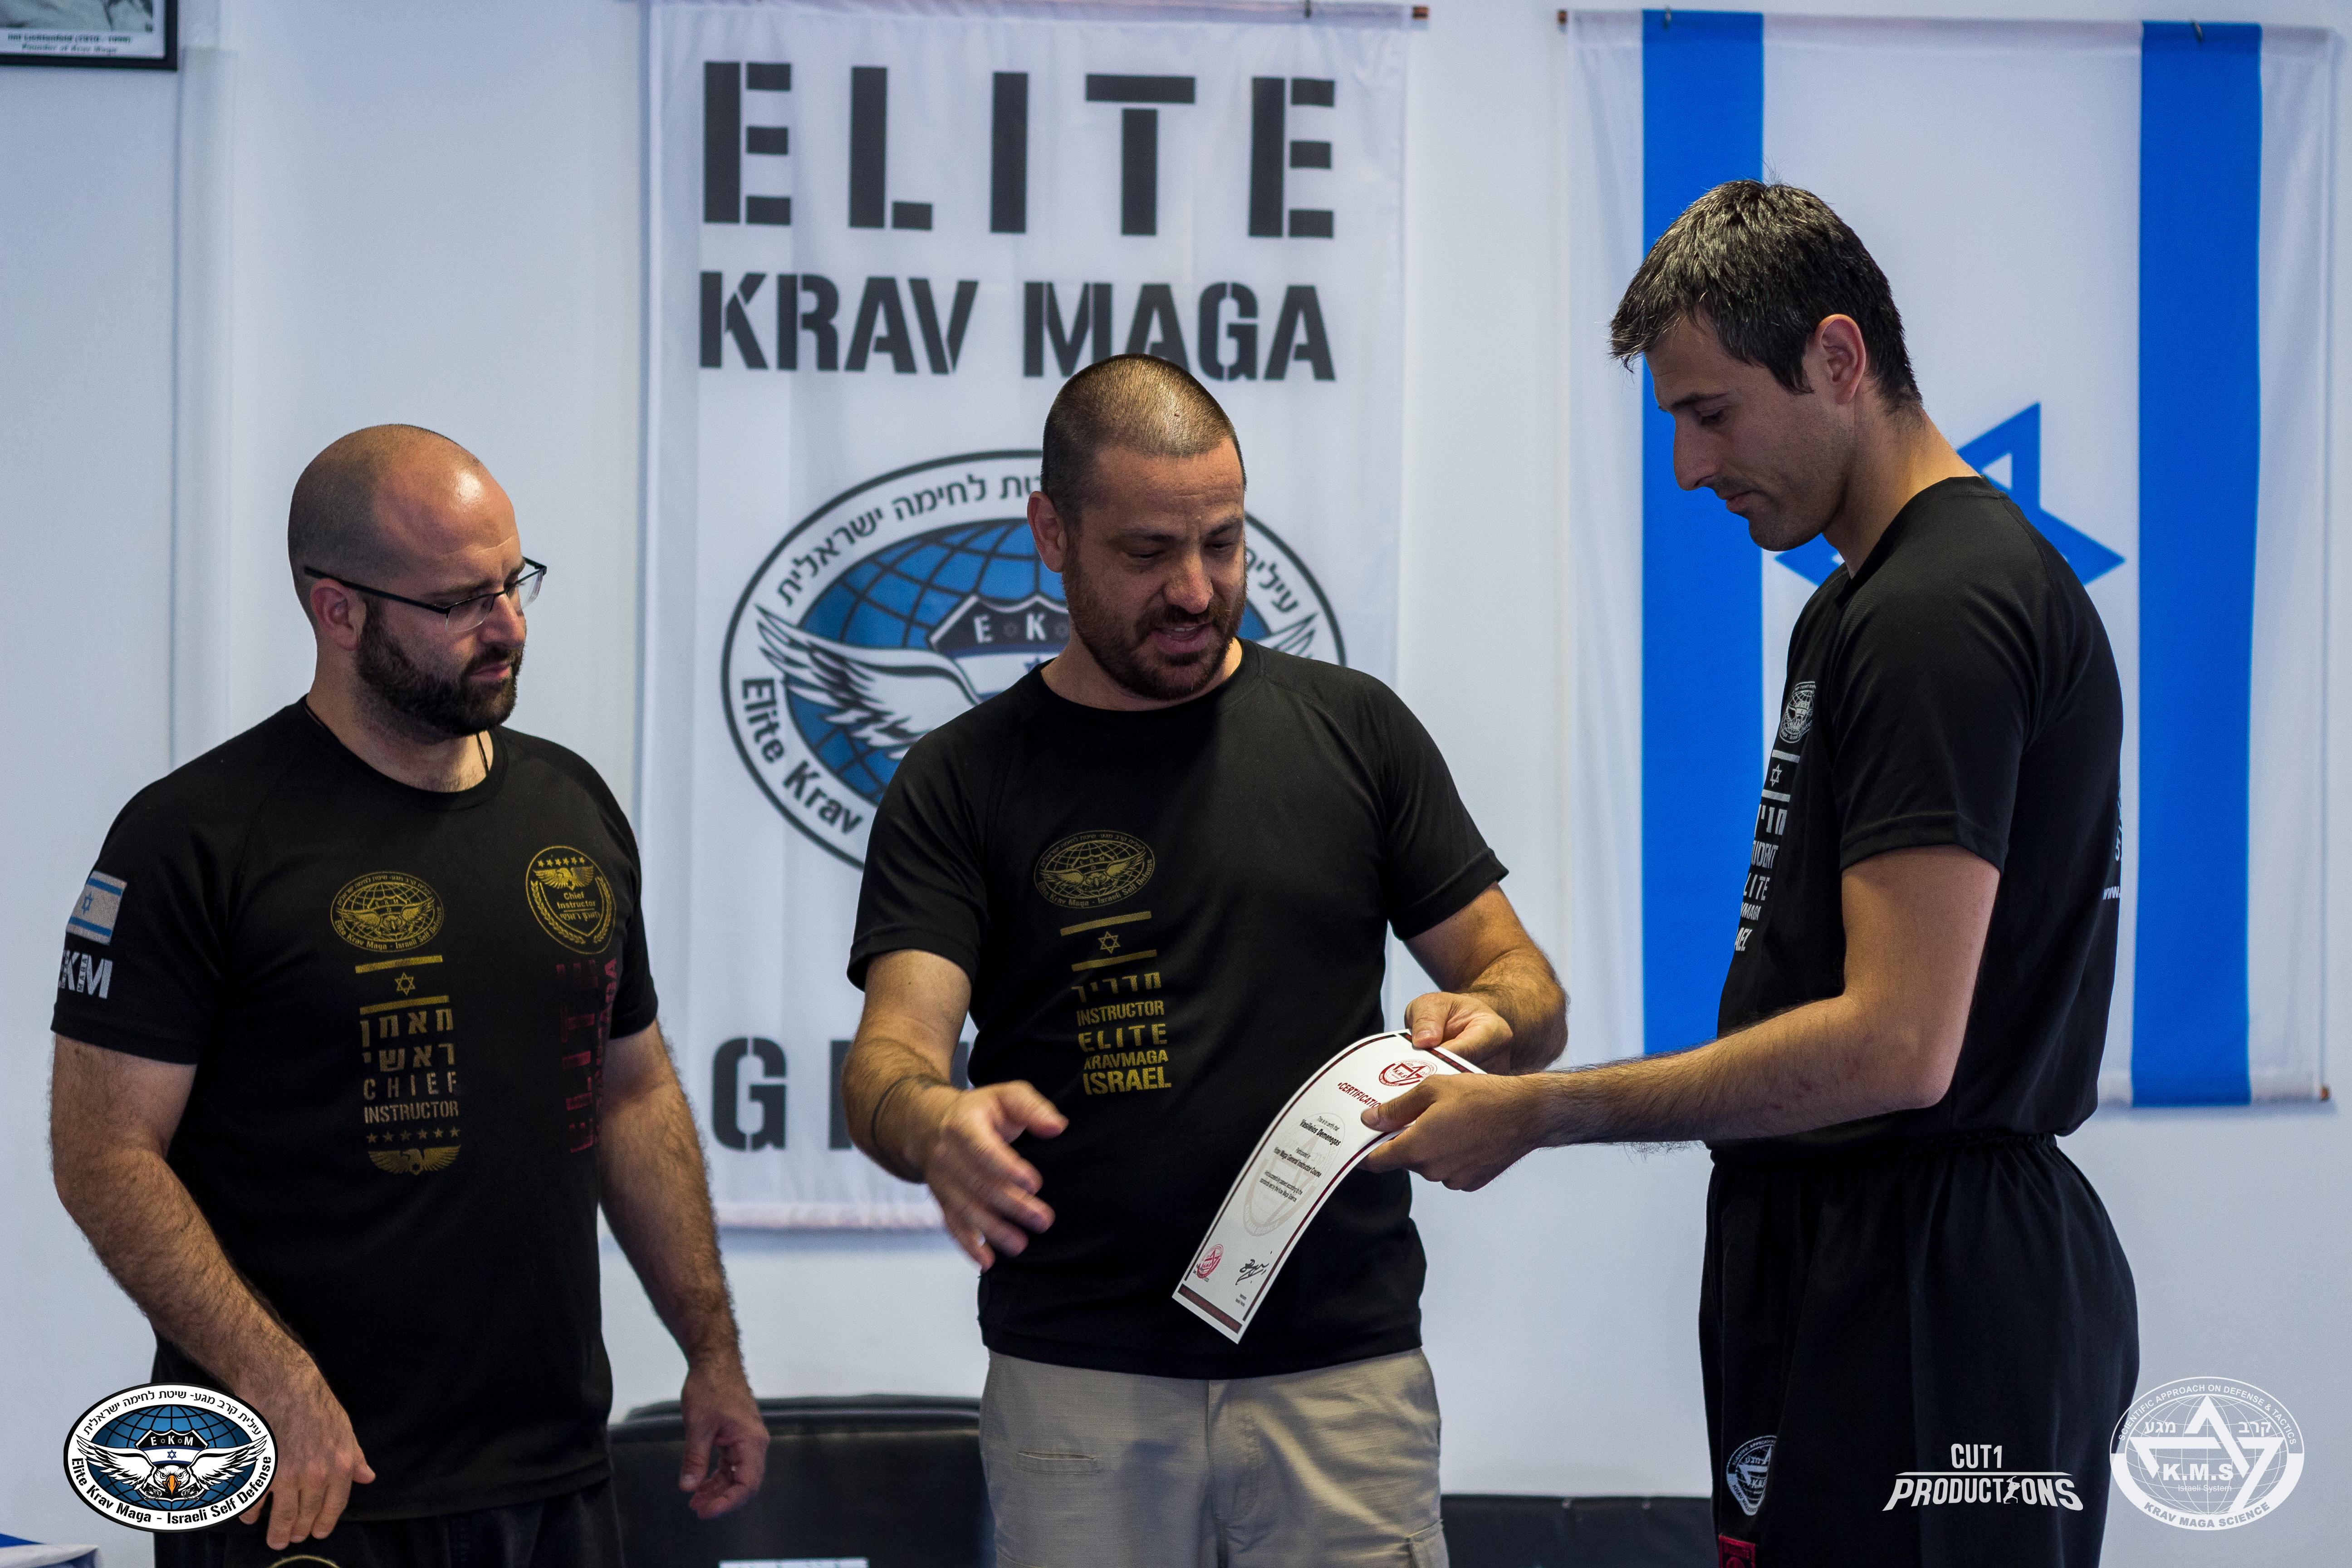 Instructor Vasileios Demenegas